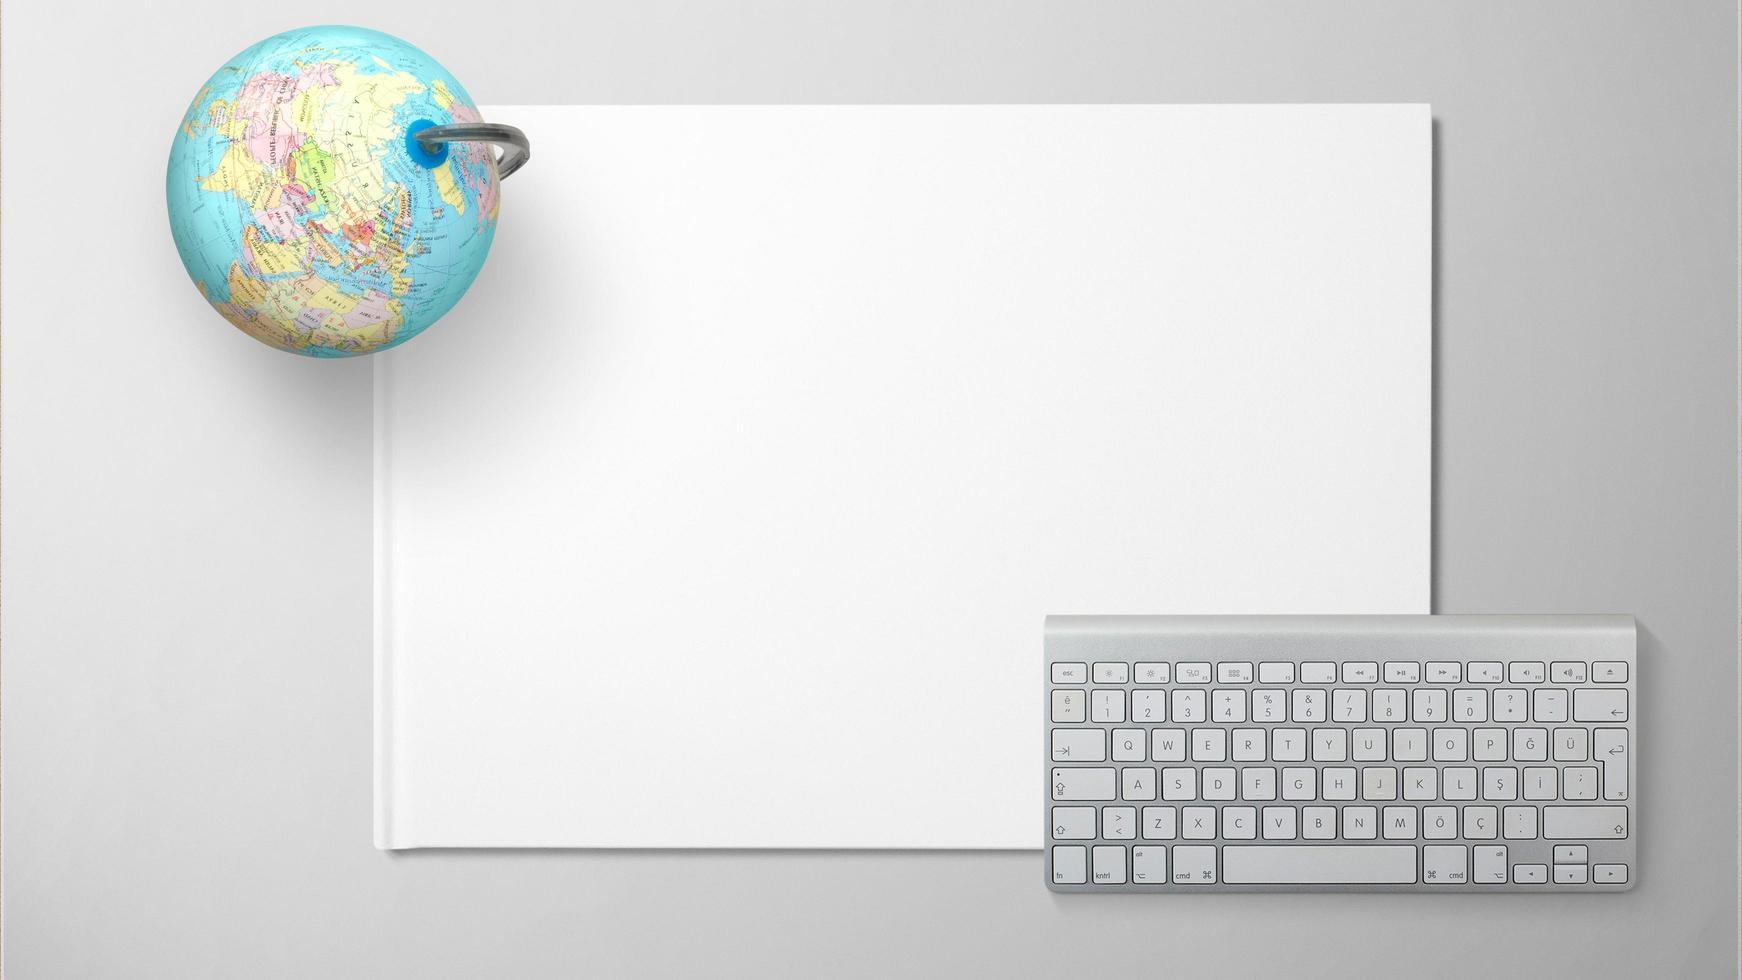 wereldbol met computertoetsenbord op wit papier op geïsoleerde achtergrond foto